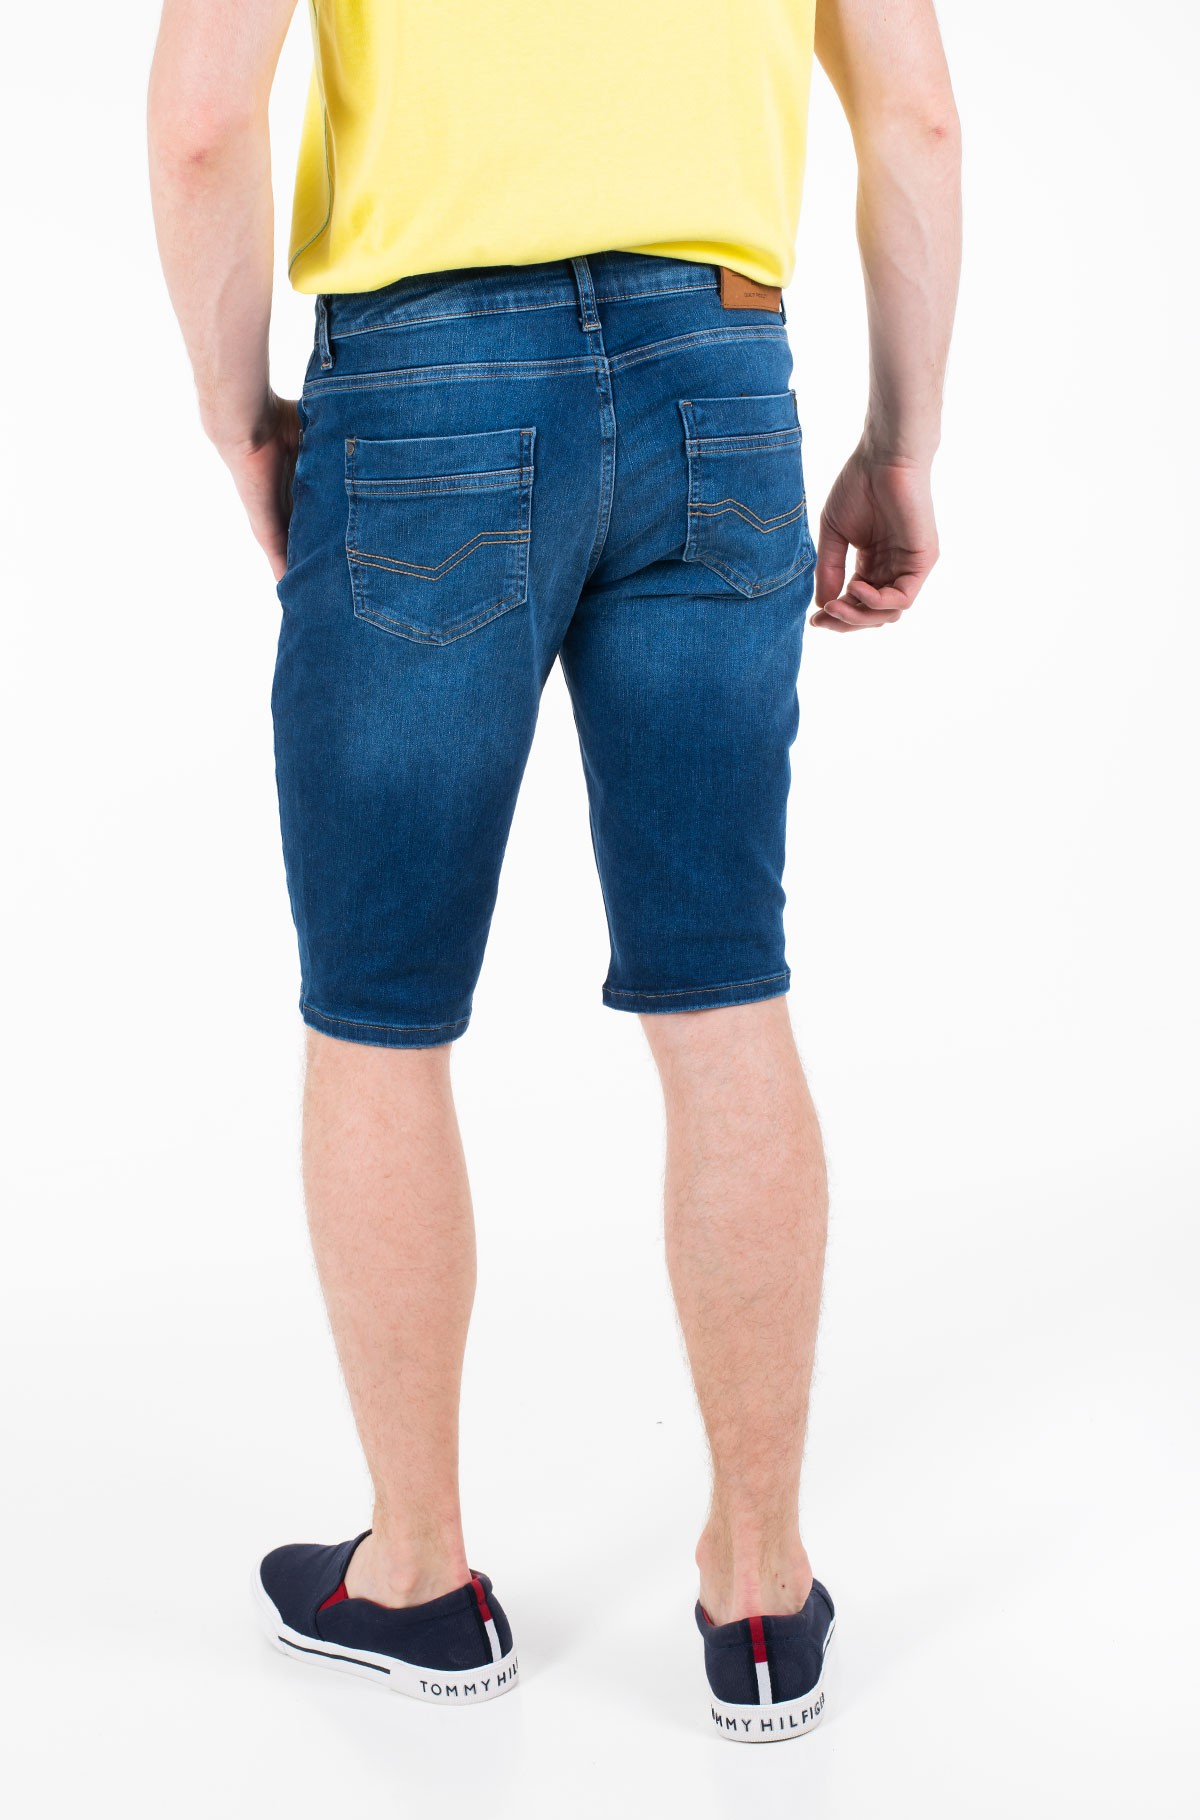 Shorts Jaanus03 shorts-full-2